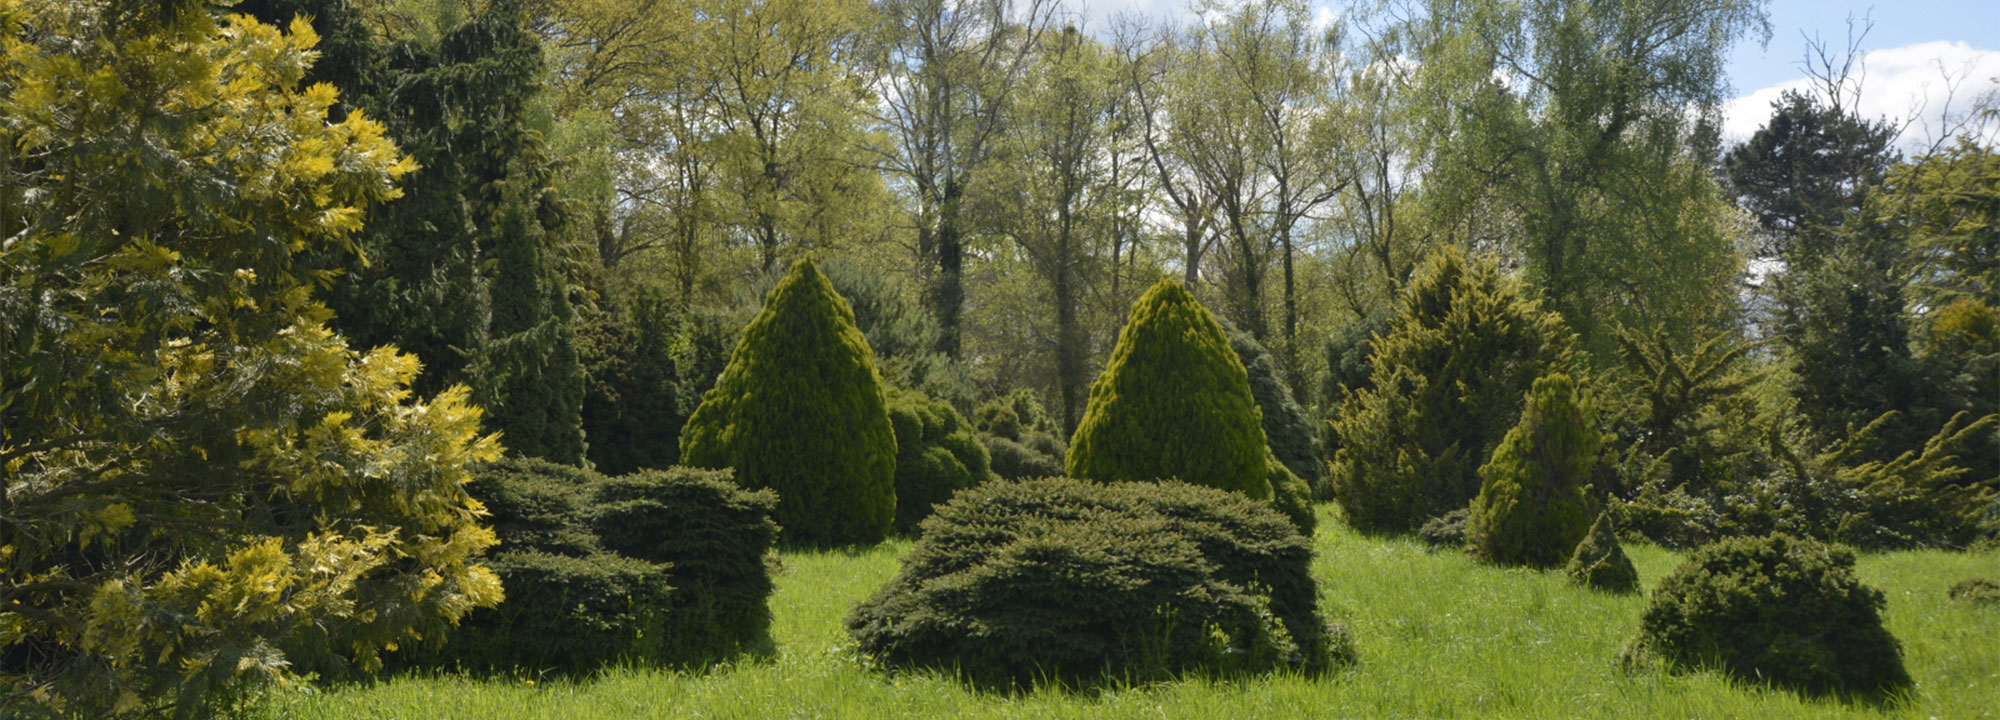 La collection de cultivars de conifères nains © MNHN - S. Gerbault